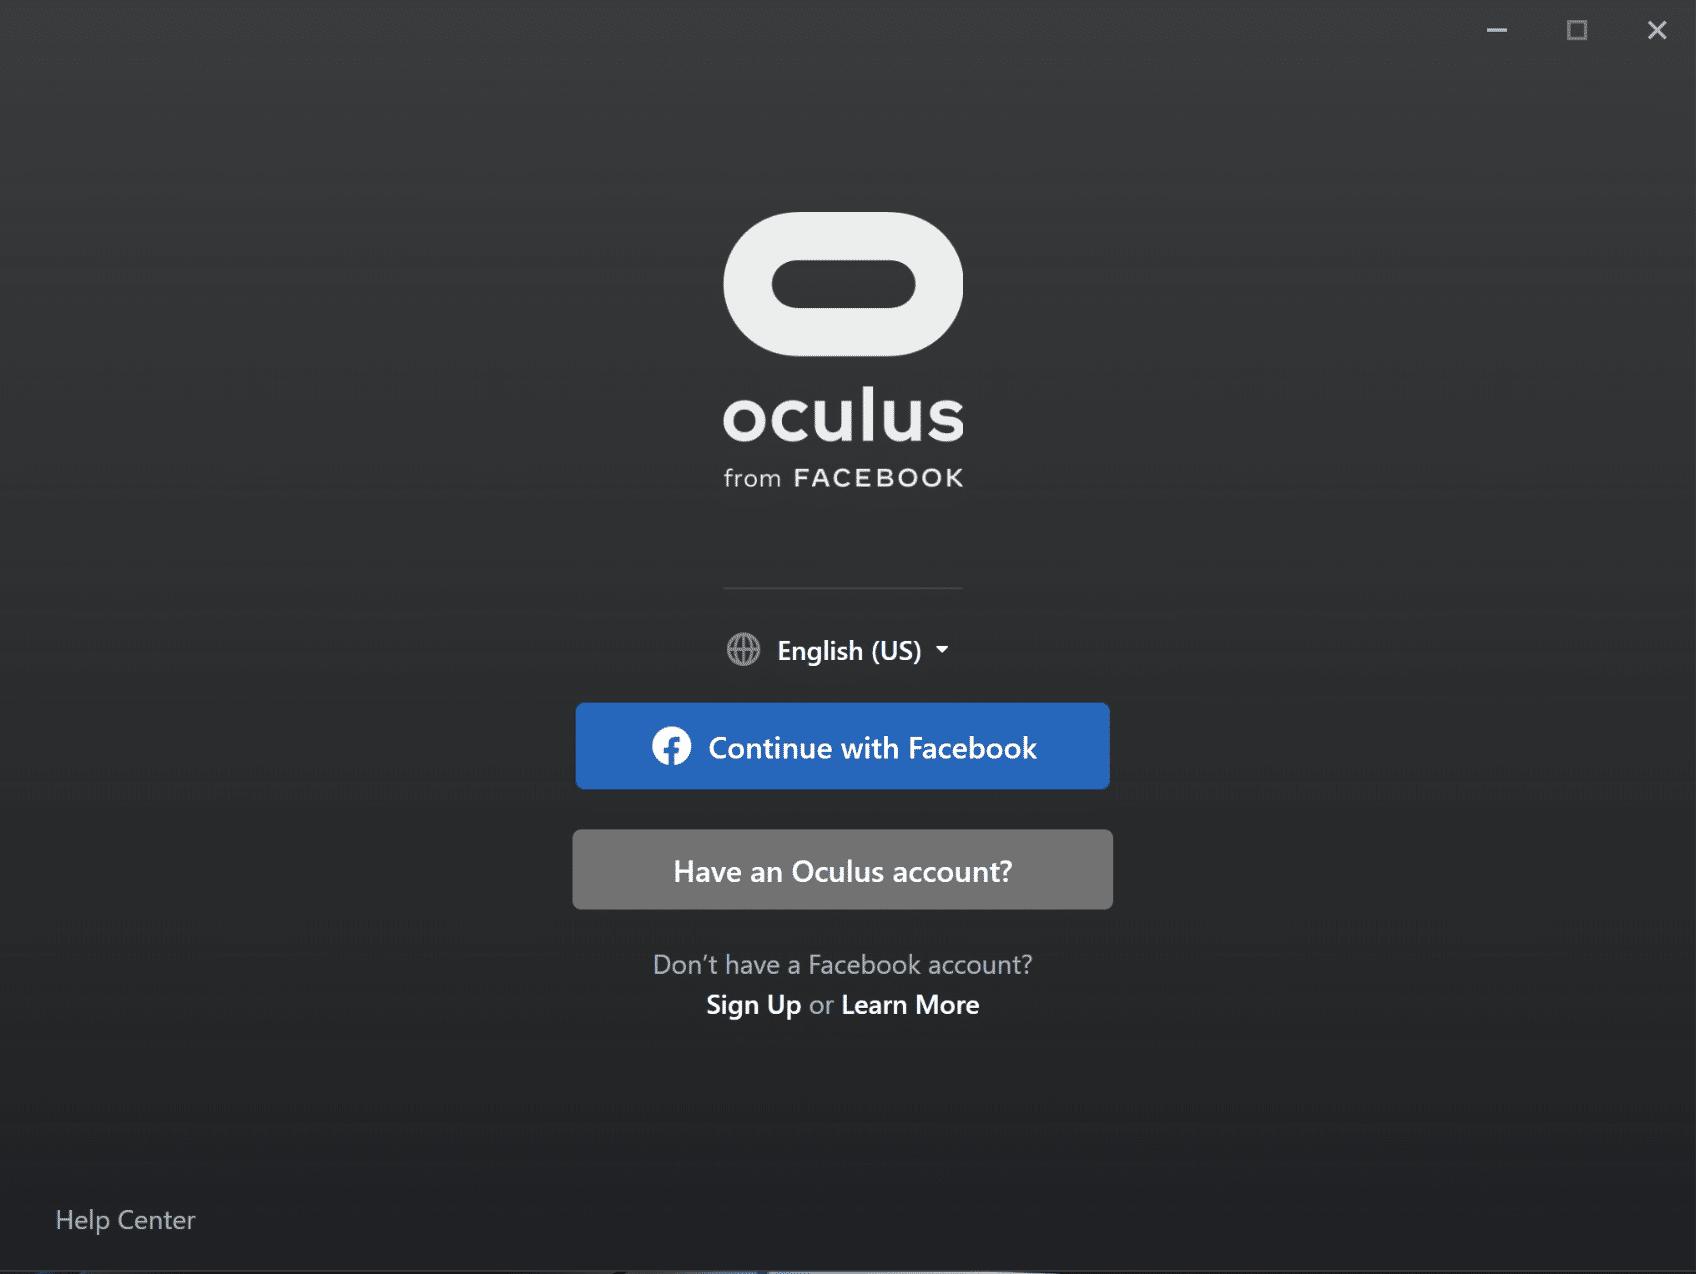 6 - oculus pc software home screen